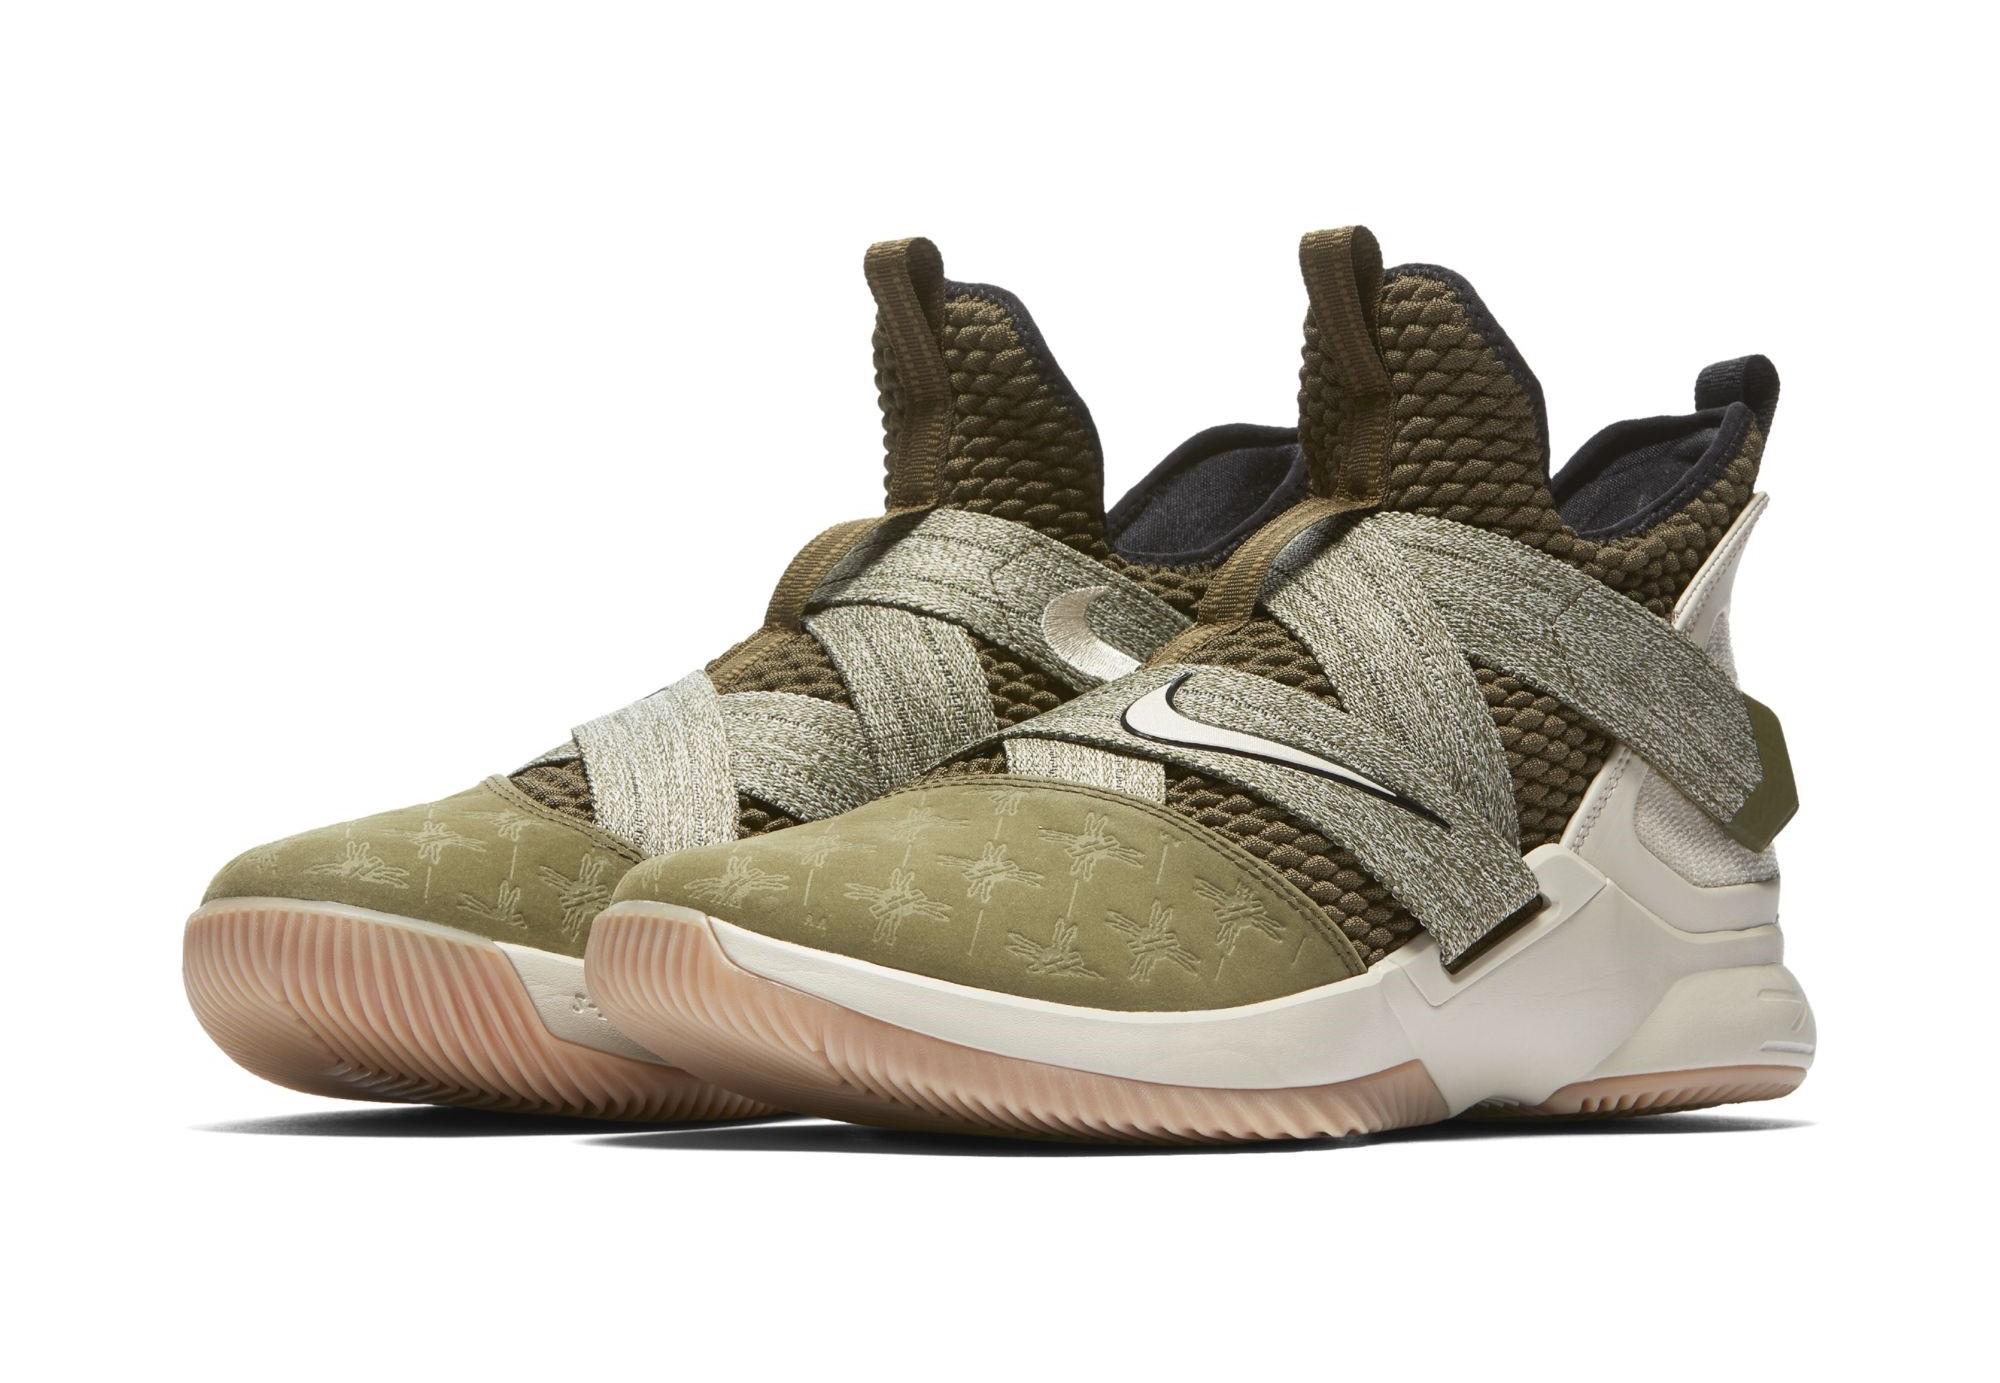 best sneakers 43f6e 67408 This Nike LeBron Soldier 12 Gets Debossed Suede Toes ...